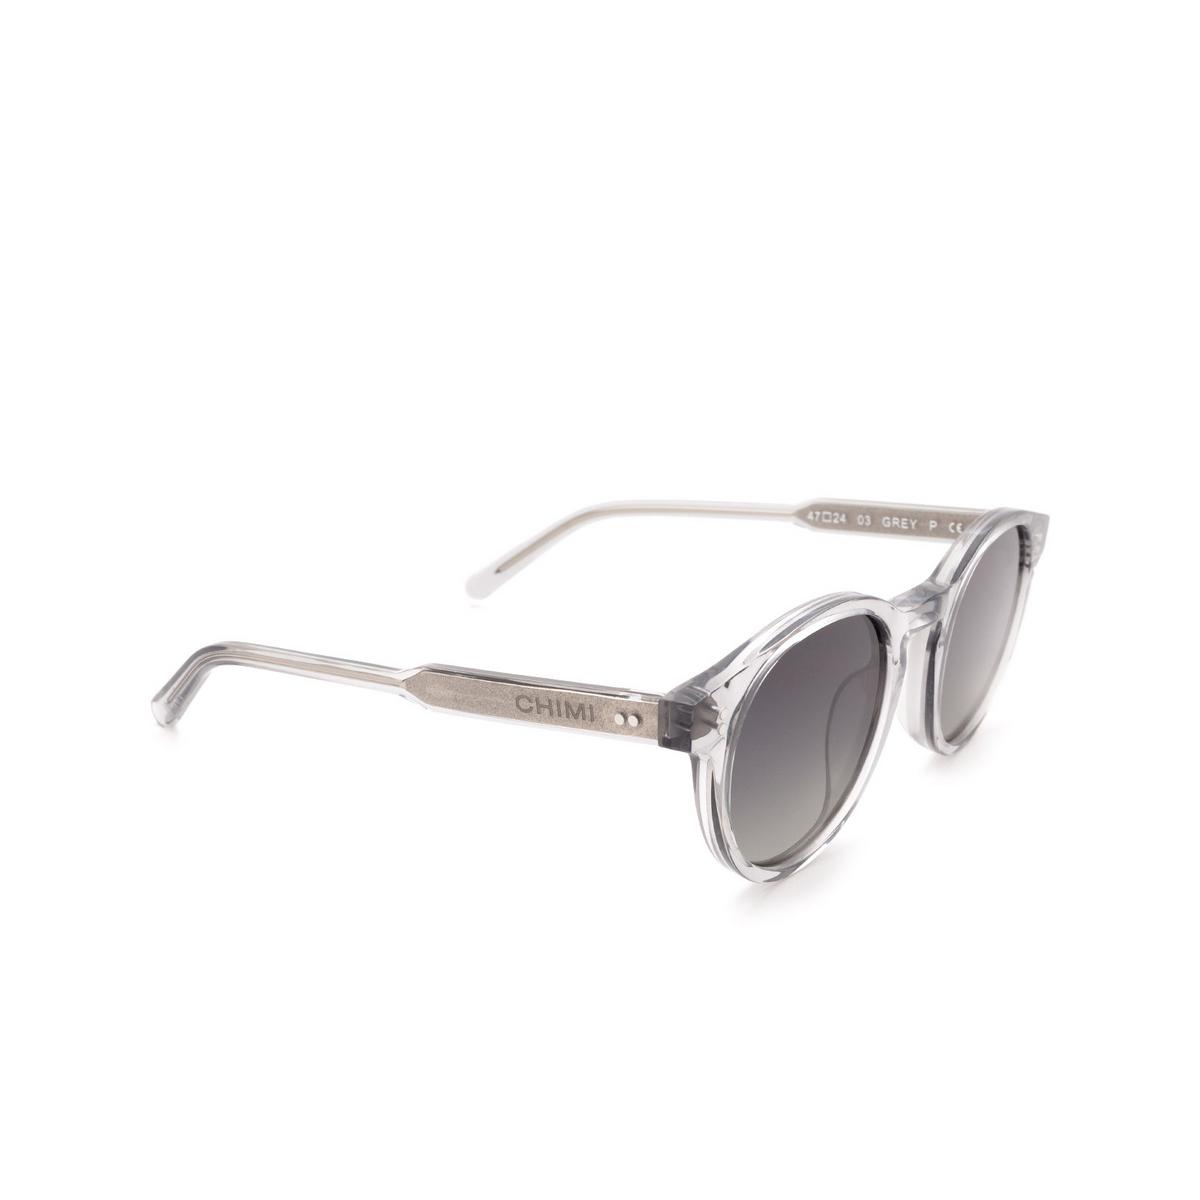 Chimi® Round Sunglasses: 03 color Grey - three-quarters view.